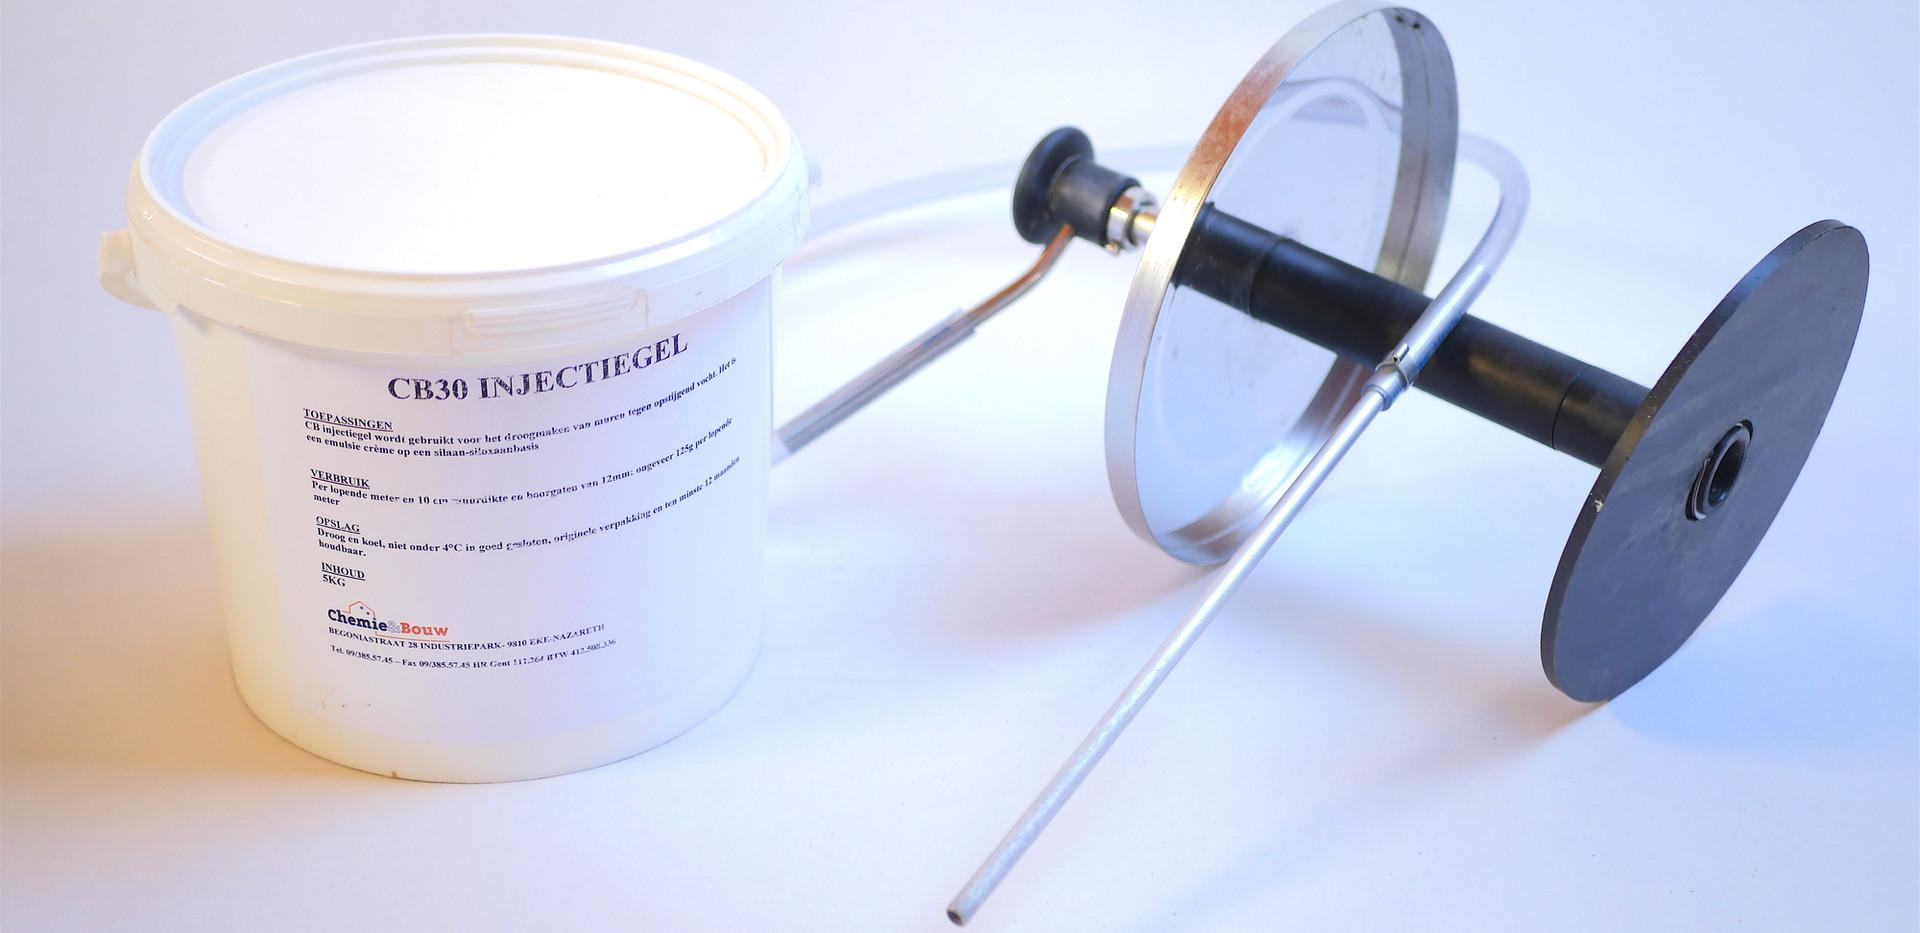 Injectiegel